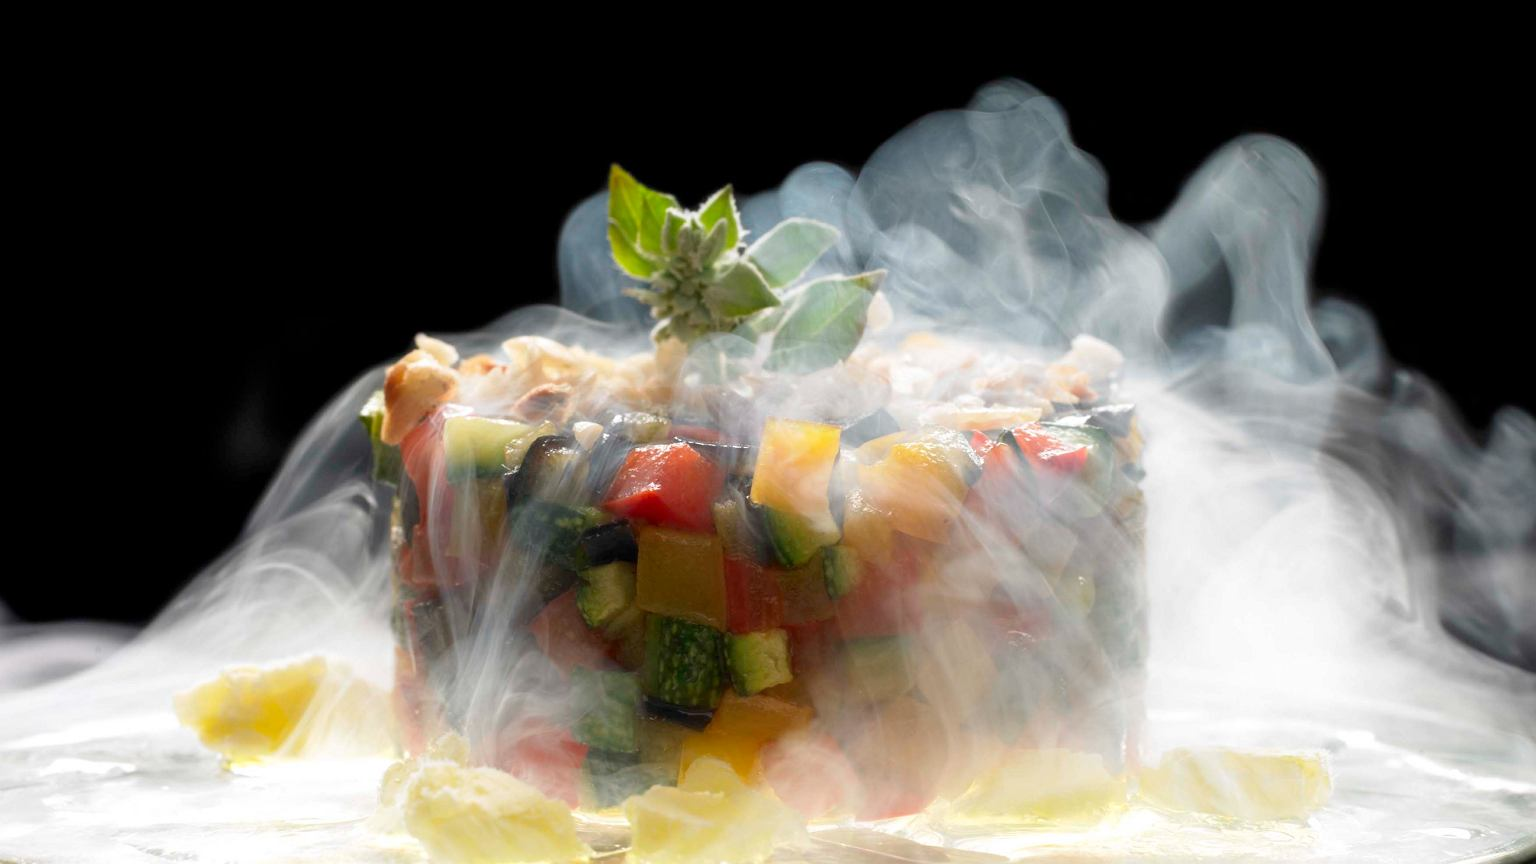 Что такое экспериментальная молекулярная кухня